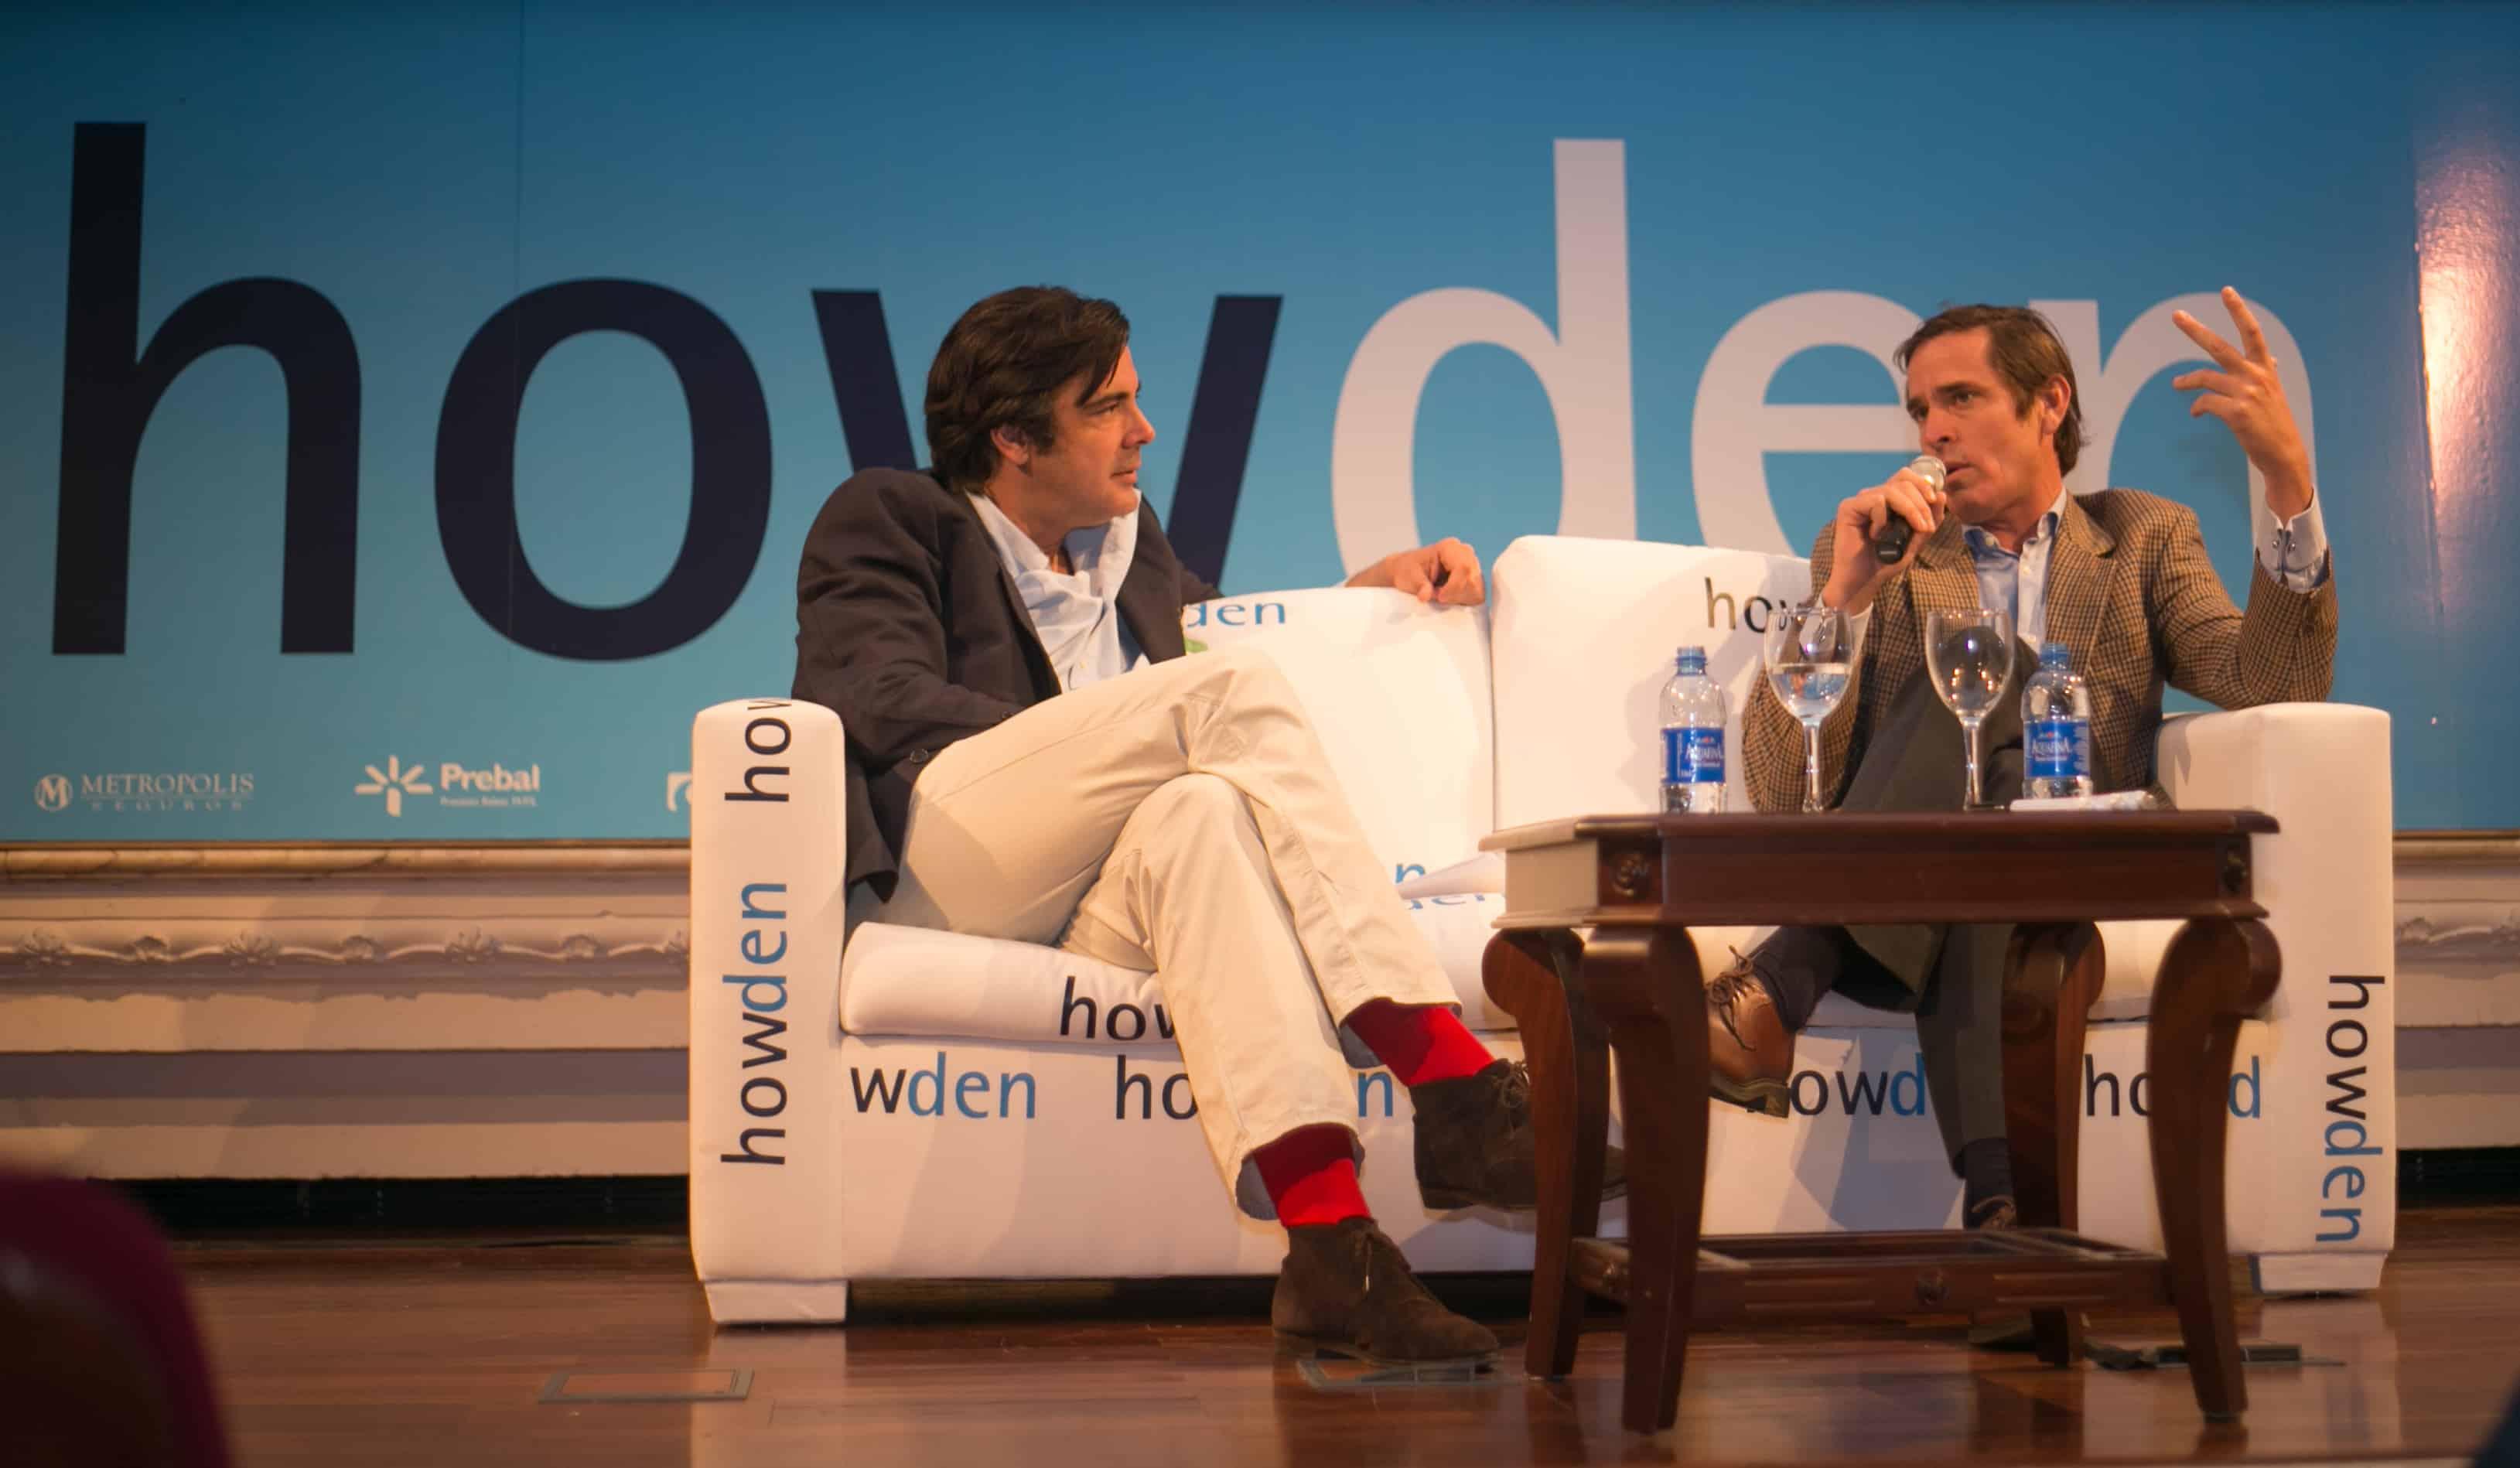 José Manuel González, CEO de Howden Iberia, entrevista al Torero Eduardo Dávila Miura